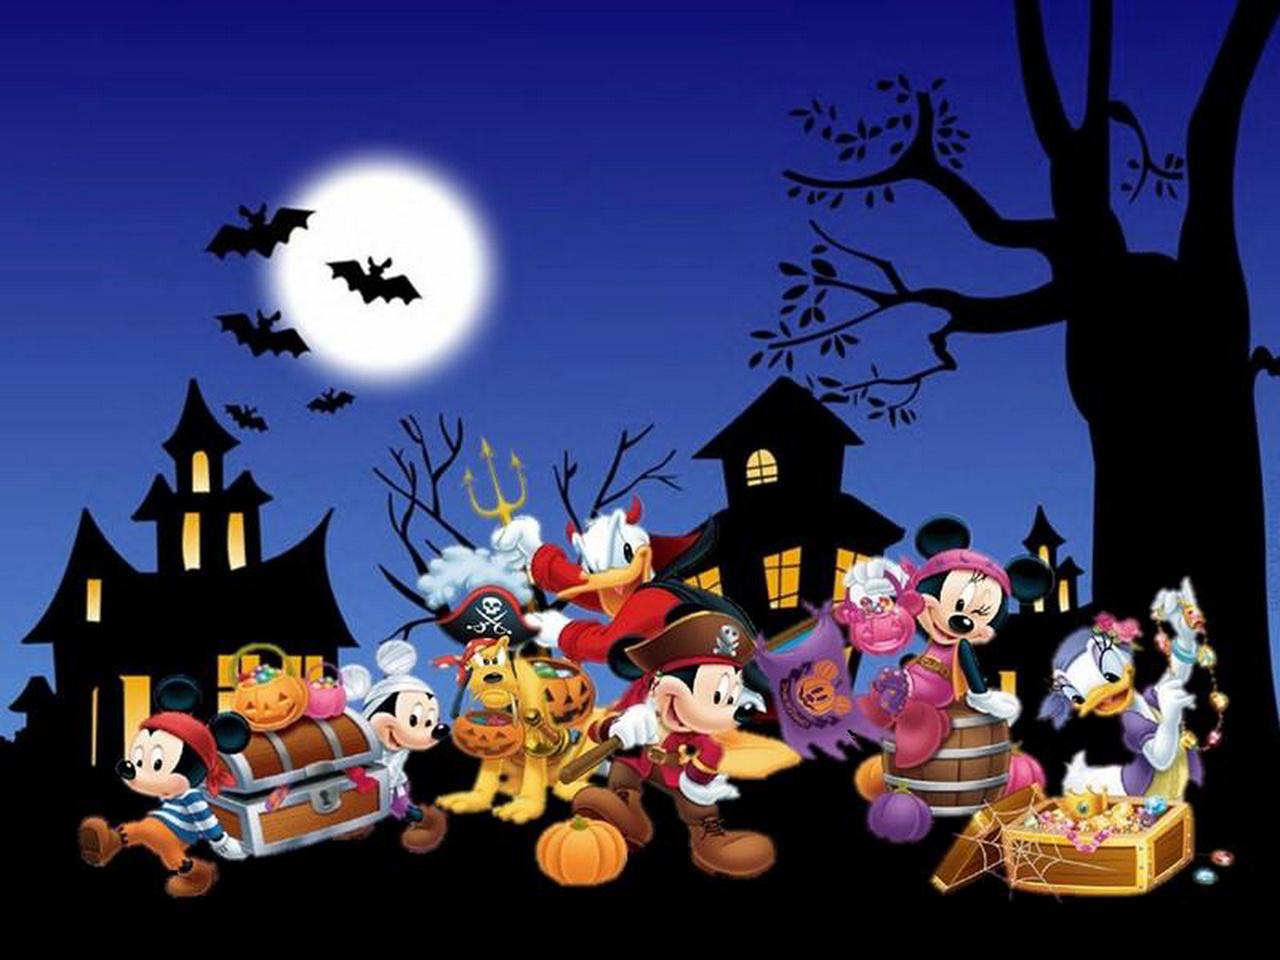 Animated Halloween Wallpaper Animated Halloween Wallpapers 1280x960